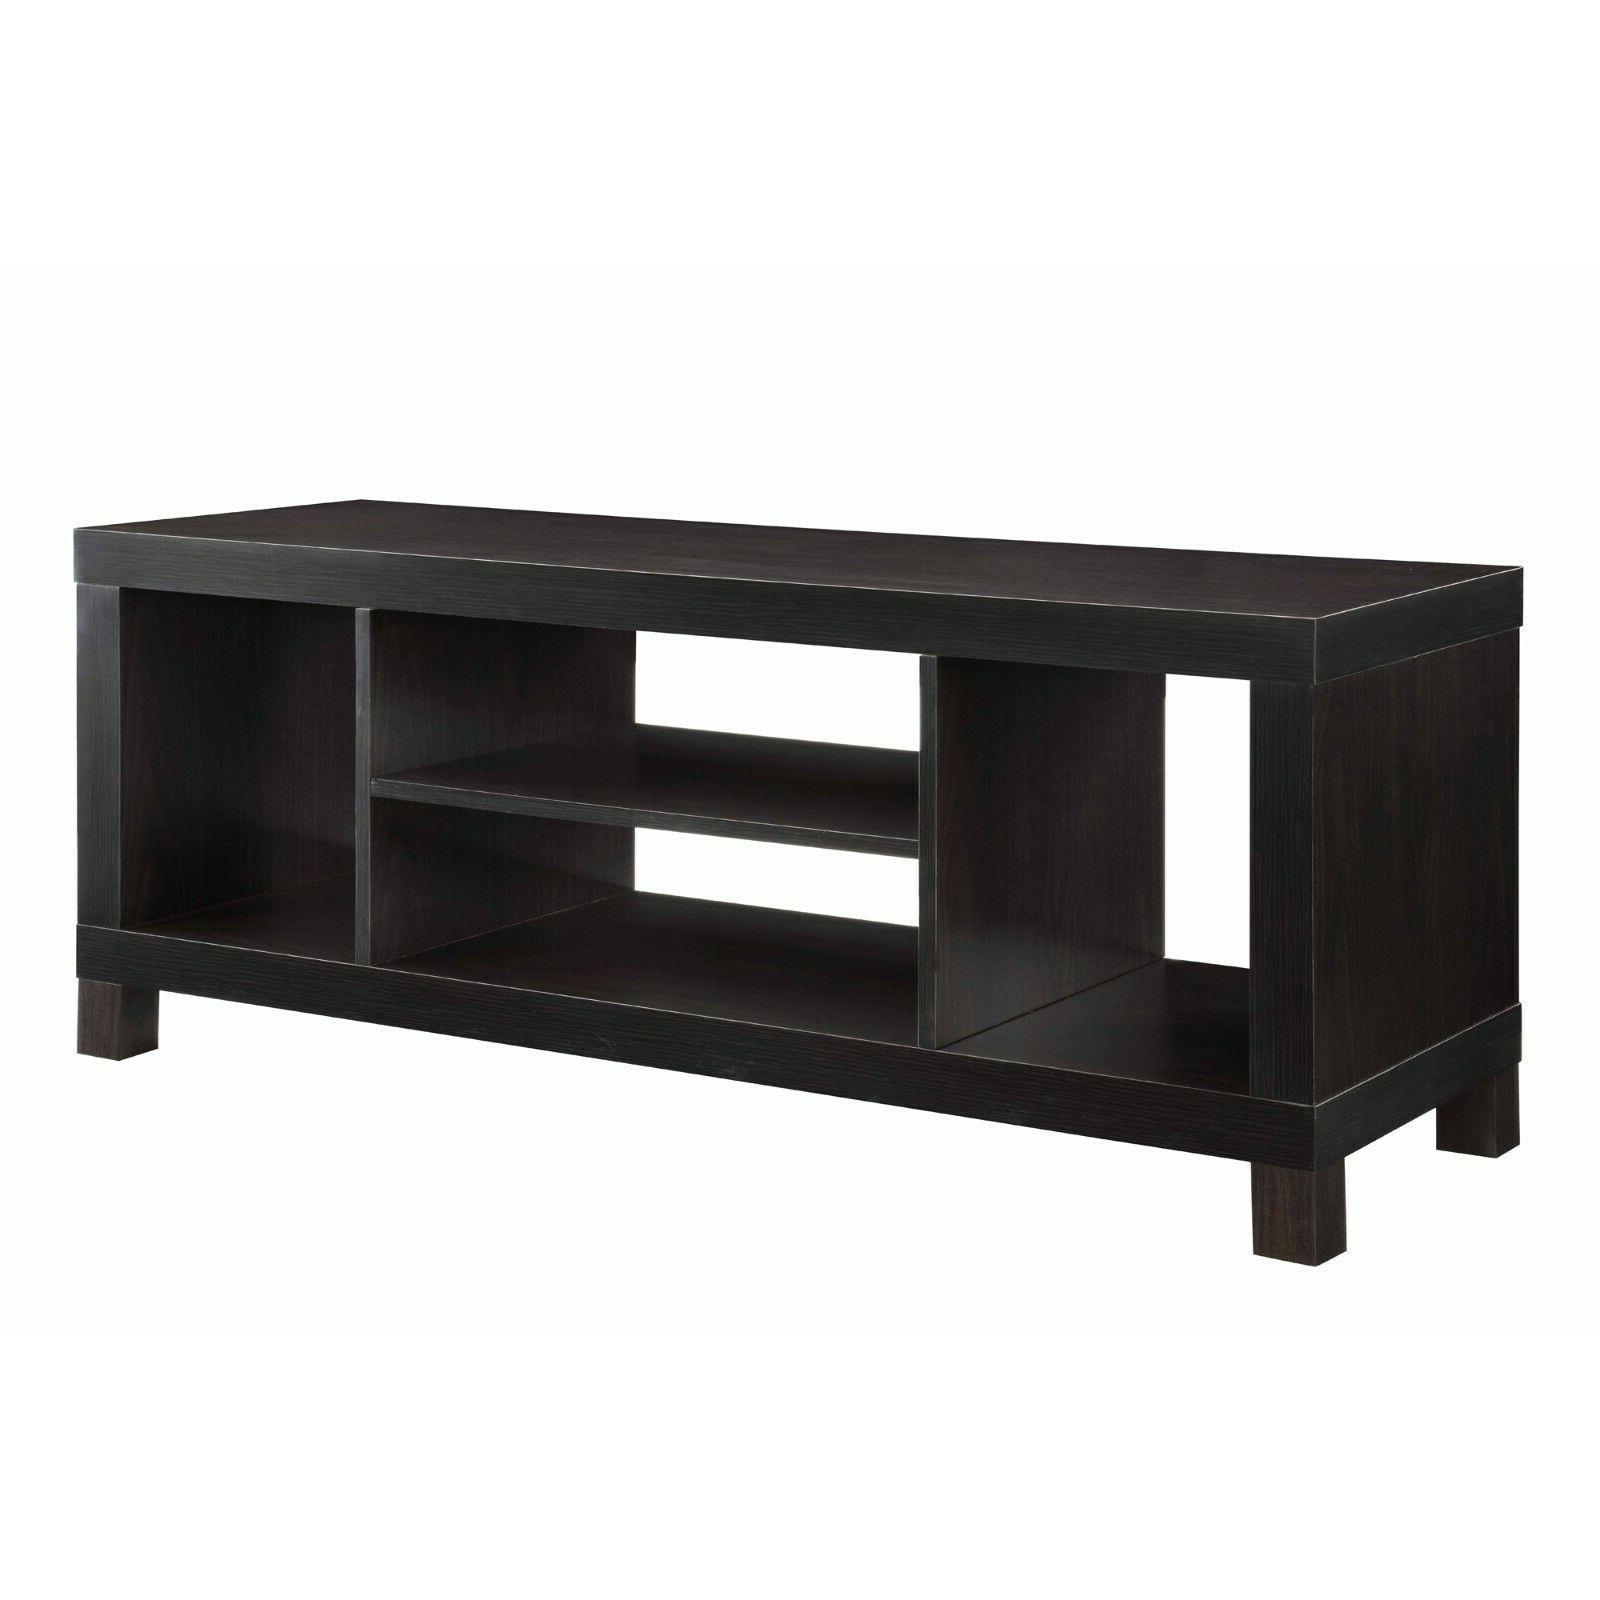 tv stand entertainment center furniture storage shelf